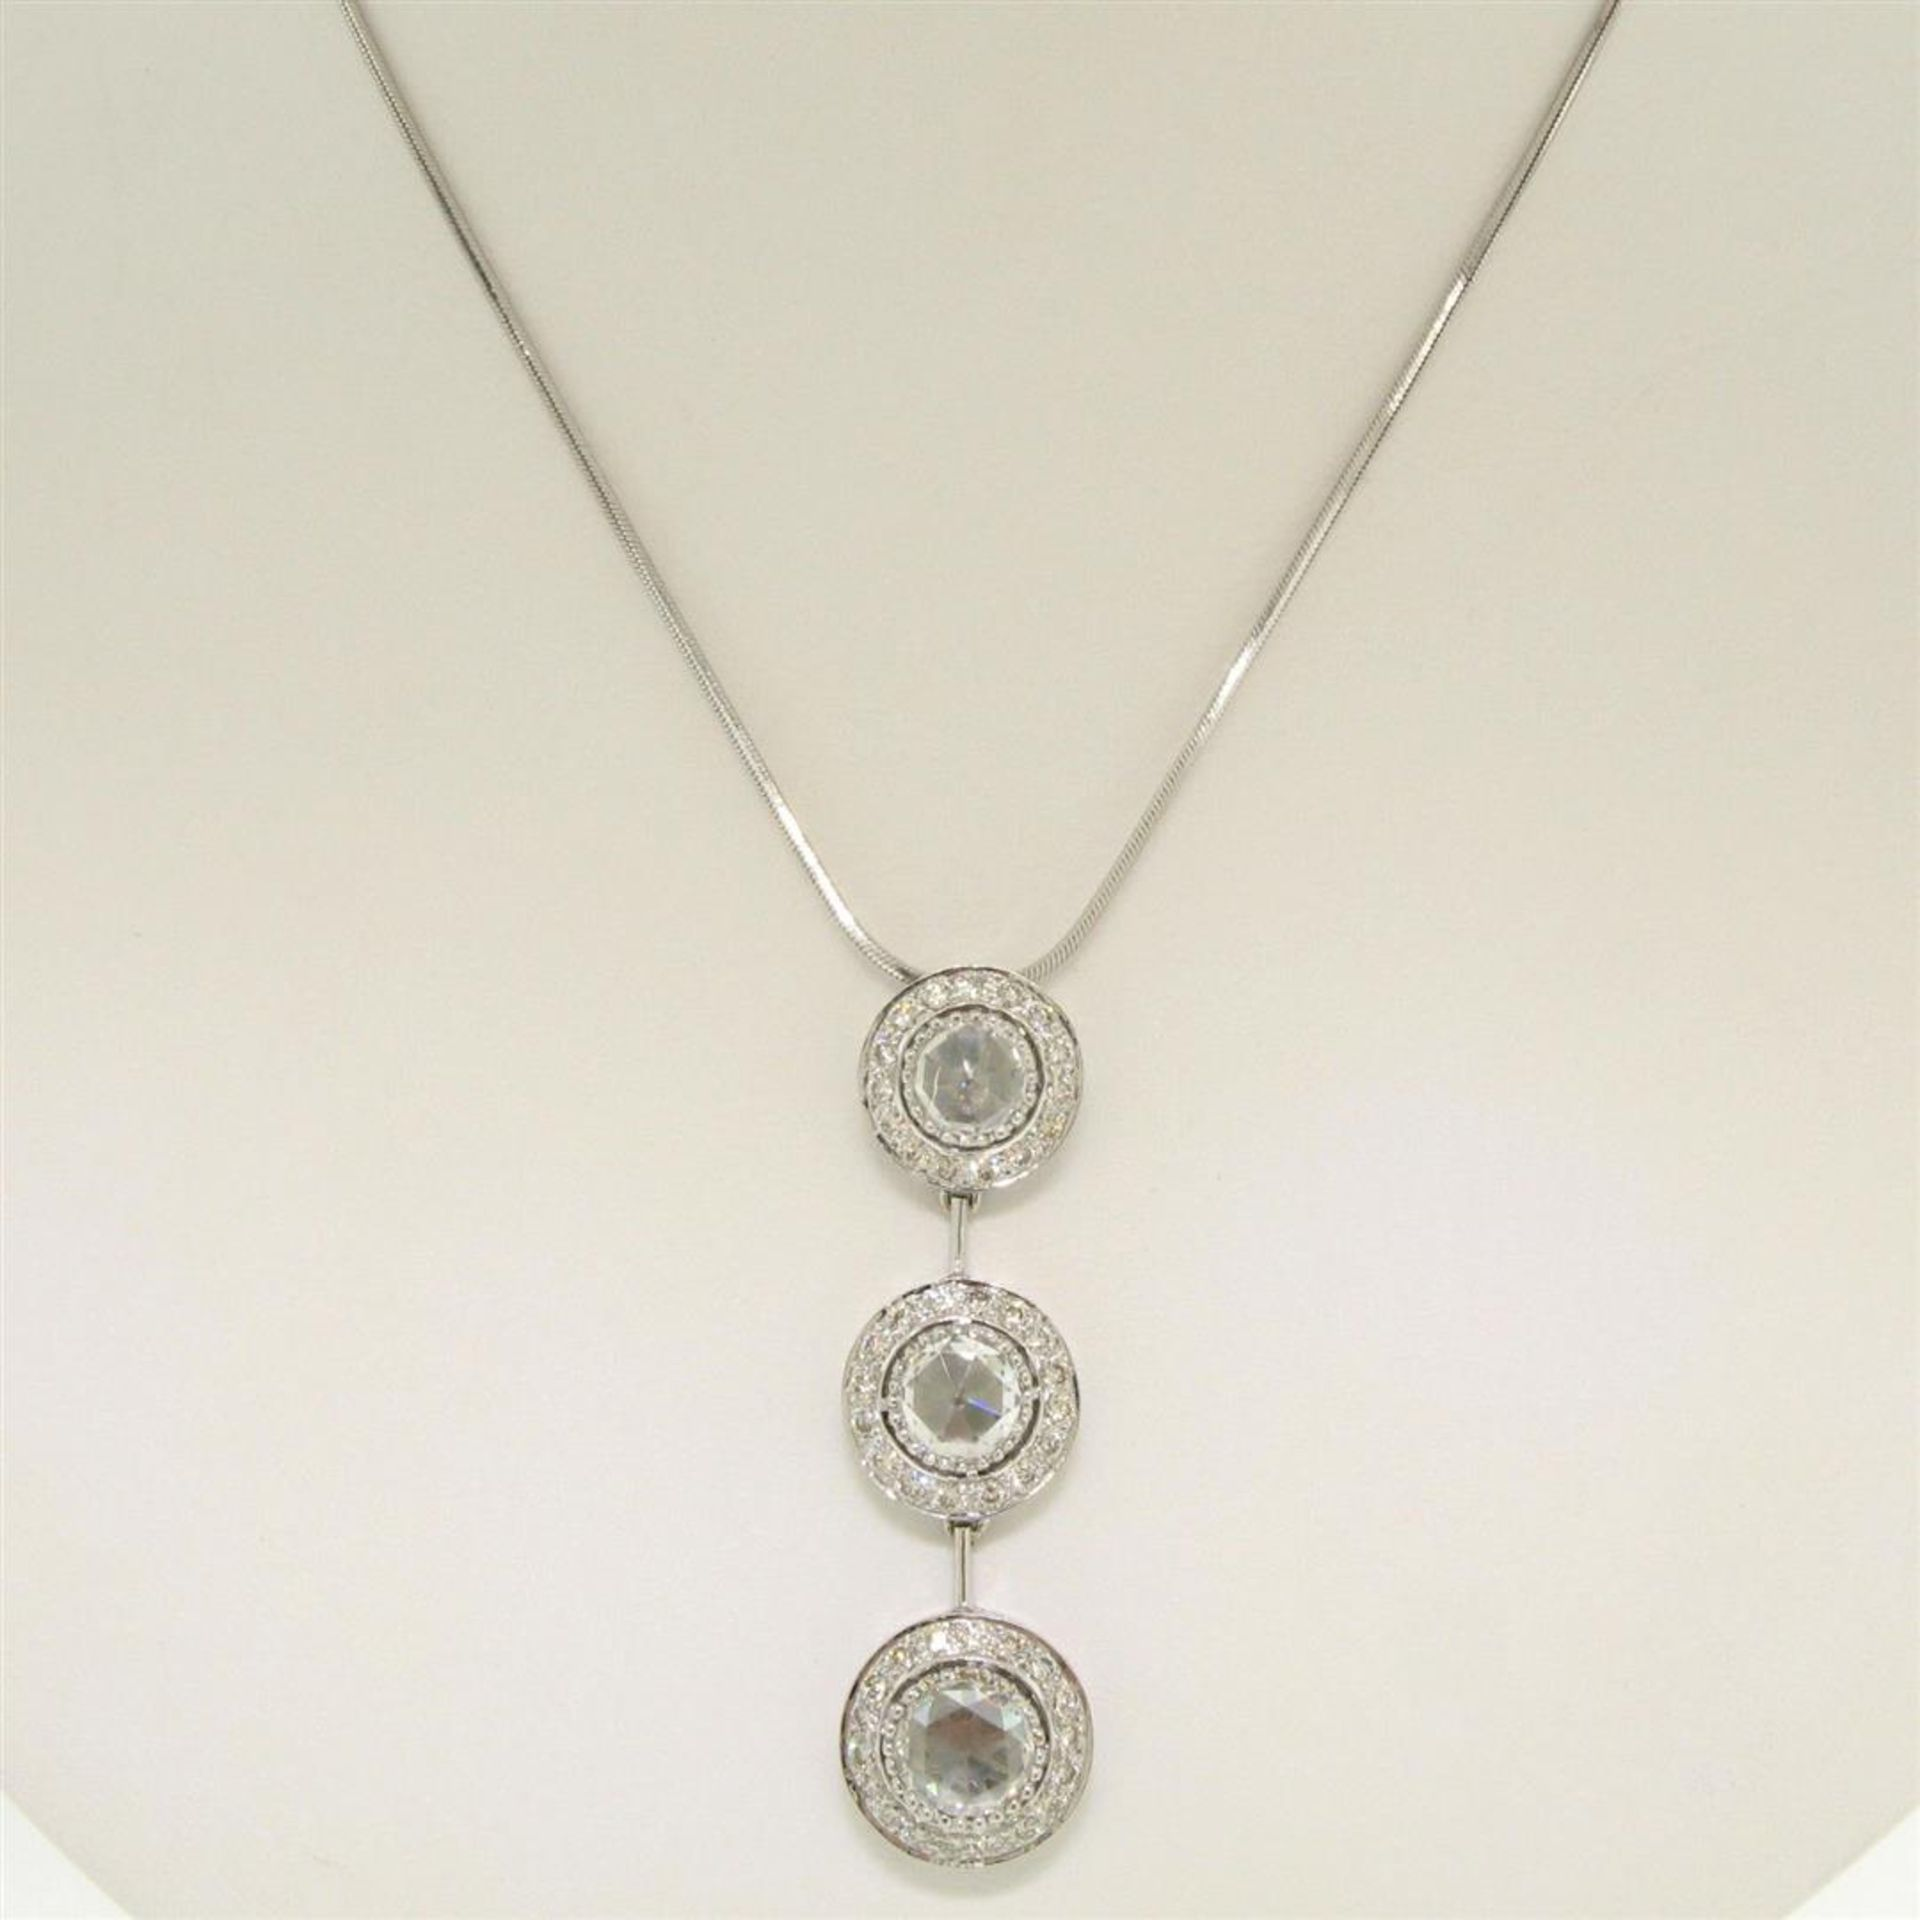 Vintage 18K White Gold 2.59 ctw 3 Rose Cut Diamond Drop Pendant w/ Triple Halo - Image 4 of 9